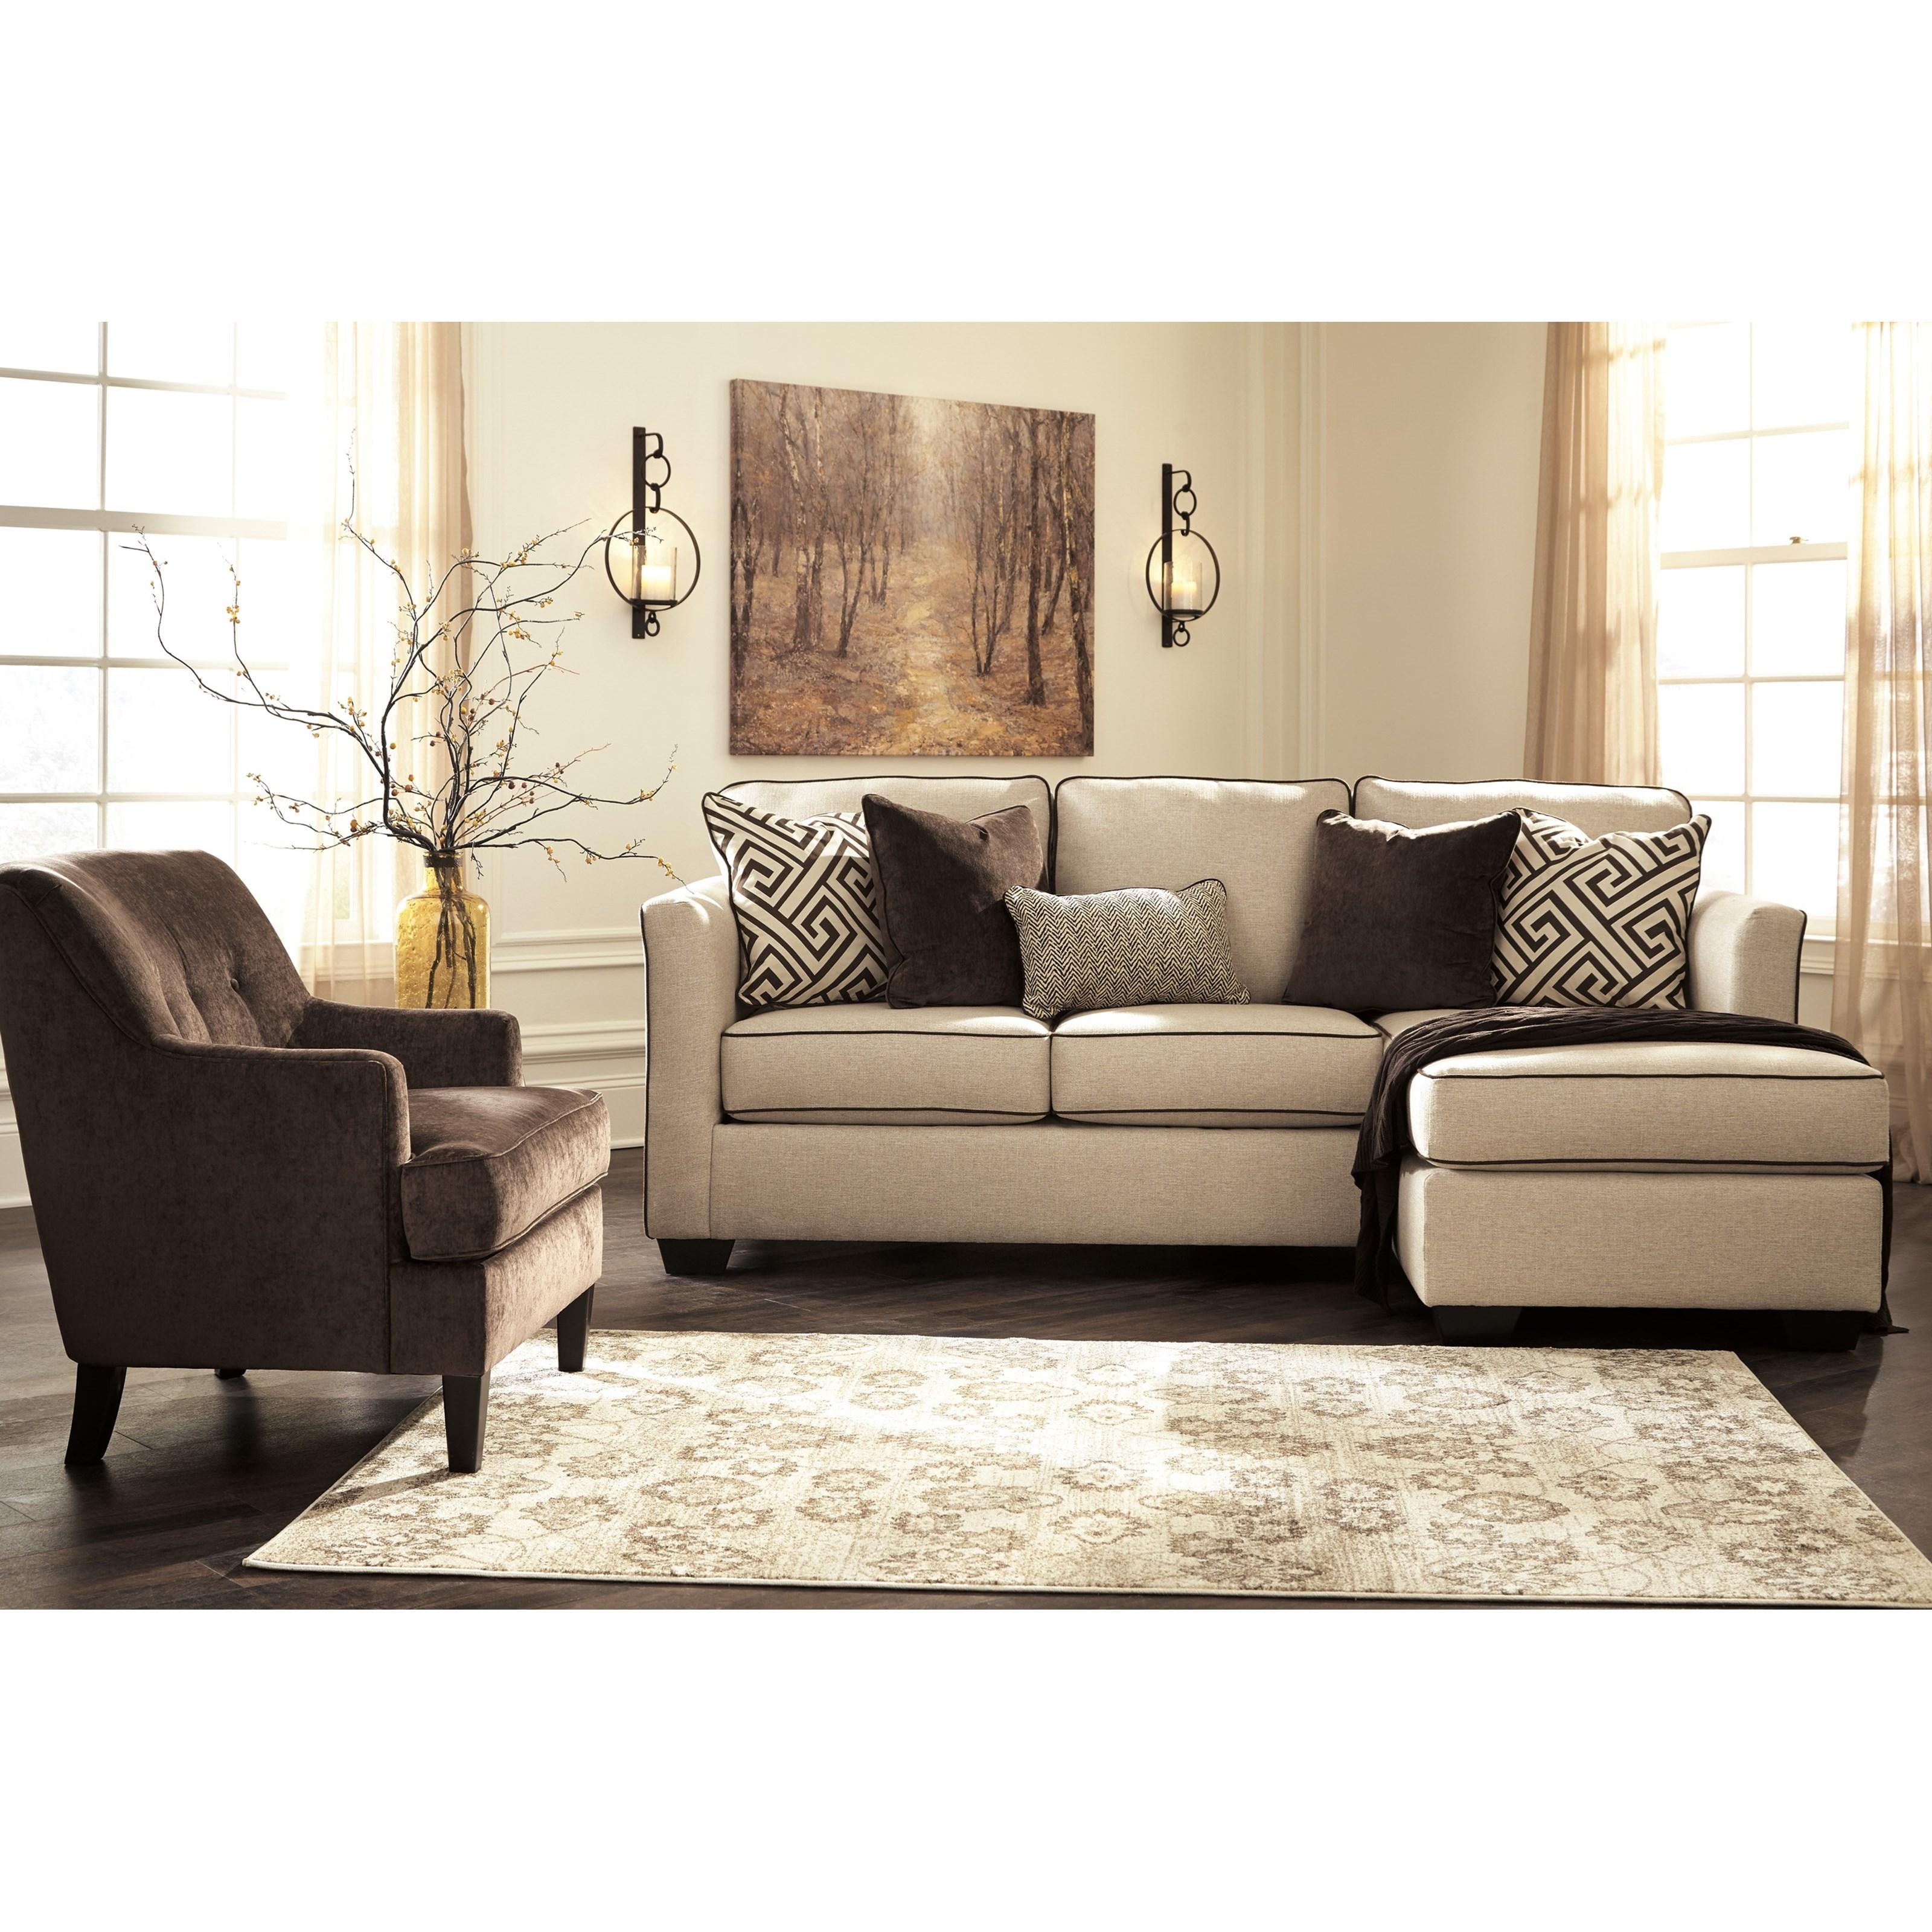 Benchcraft Carlinworth Stationary Living Room Group - Item Number: 84401 Living Room Group 2